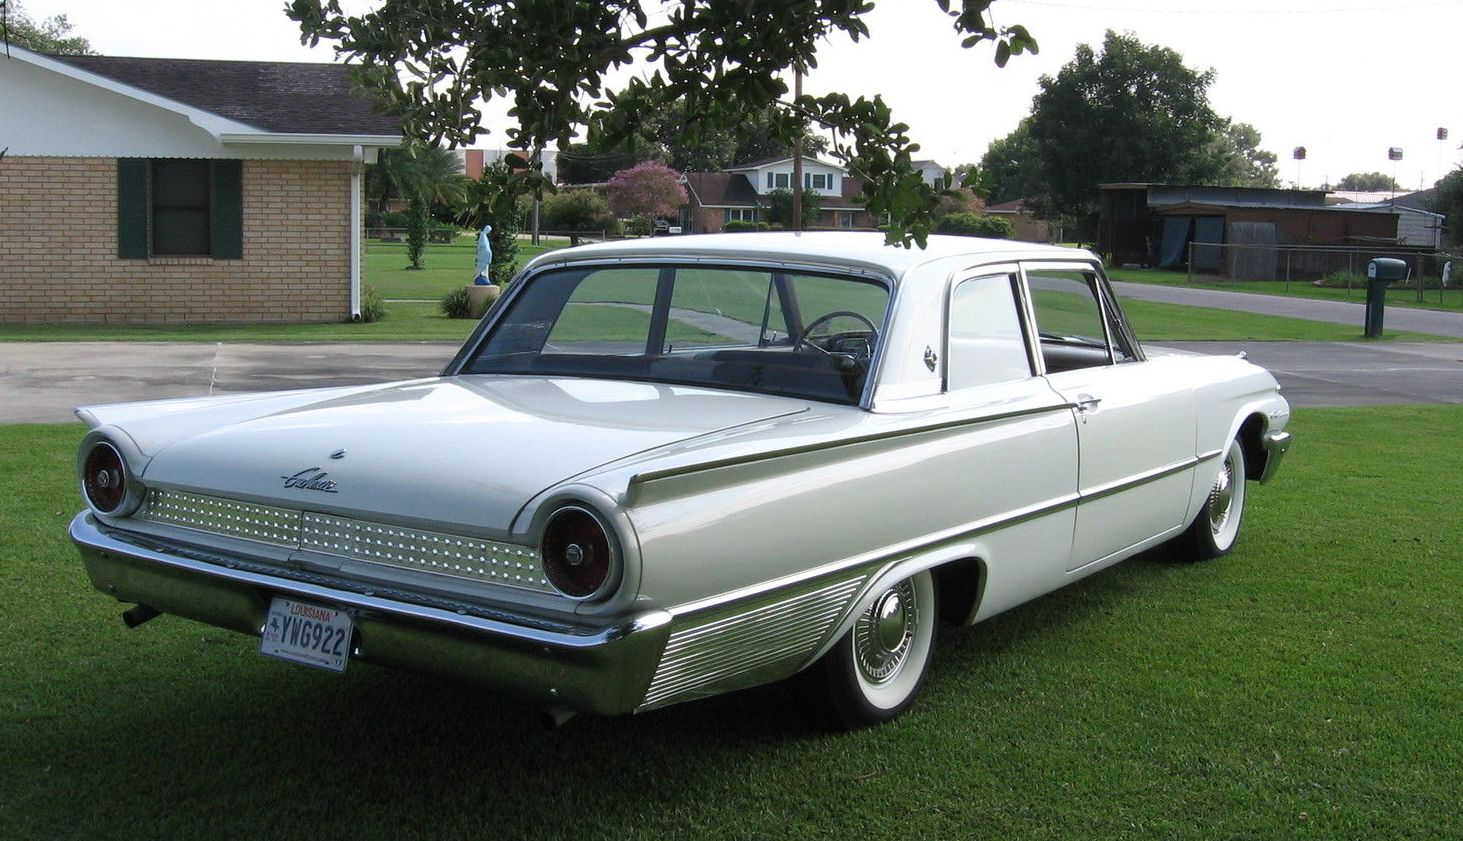 4 Door Corvette >> All American Classic Cars: 1961 Ford Galaxie 2-Door Club Sedan